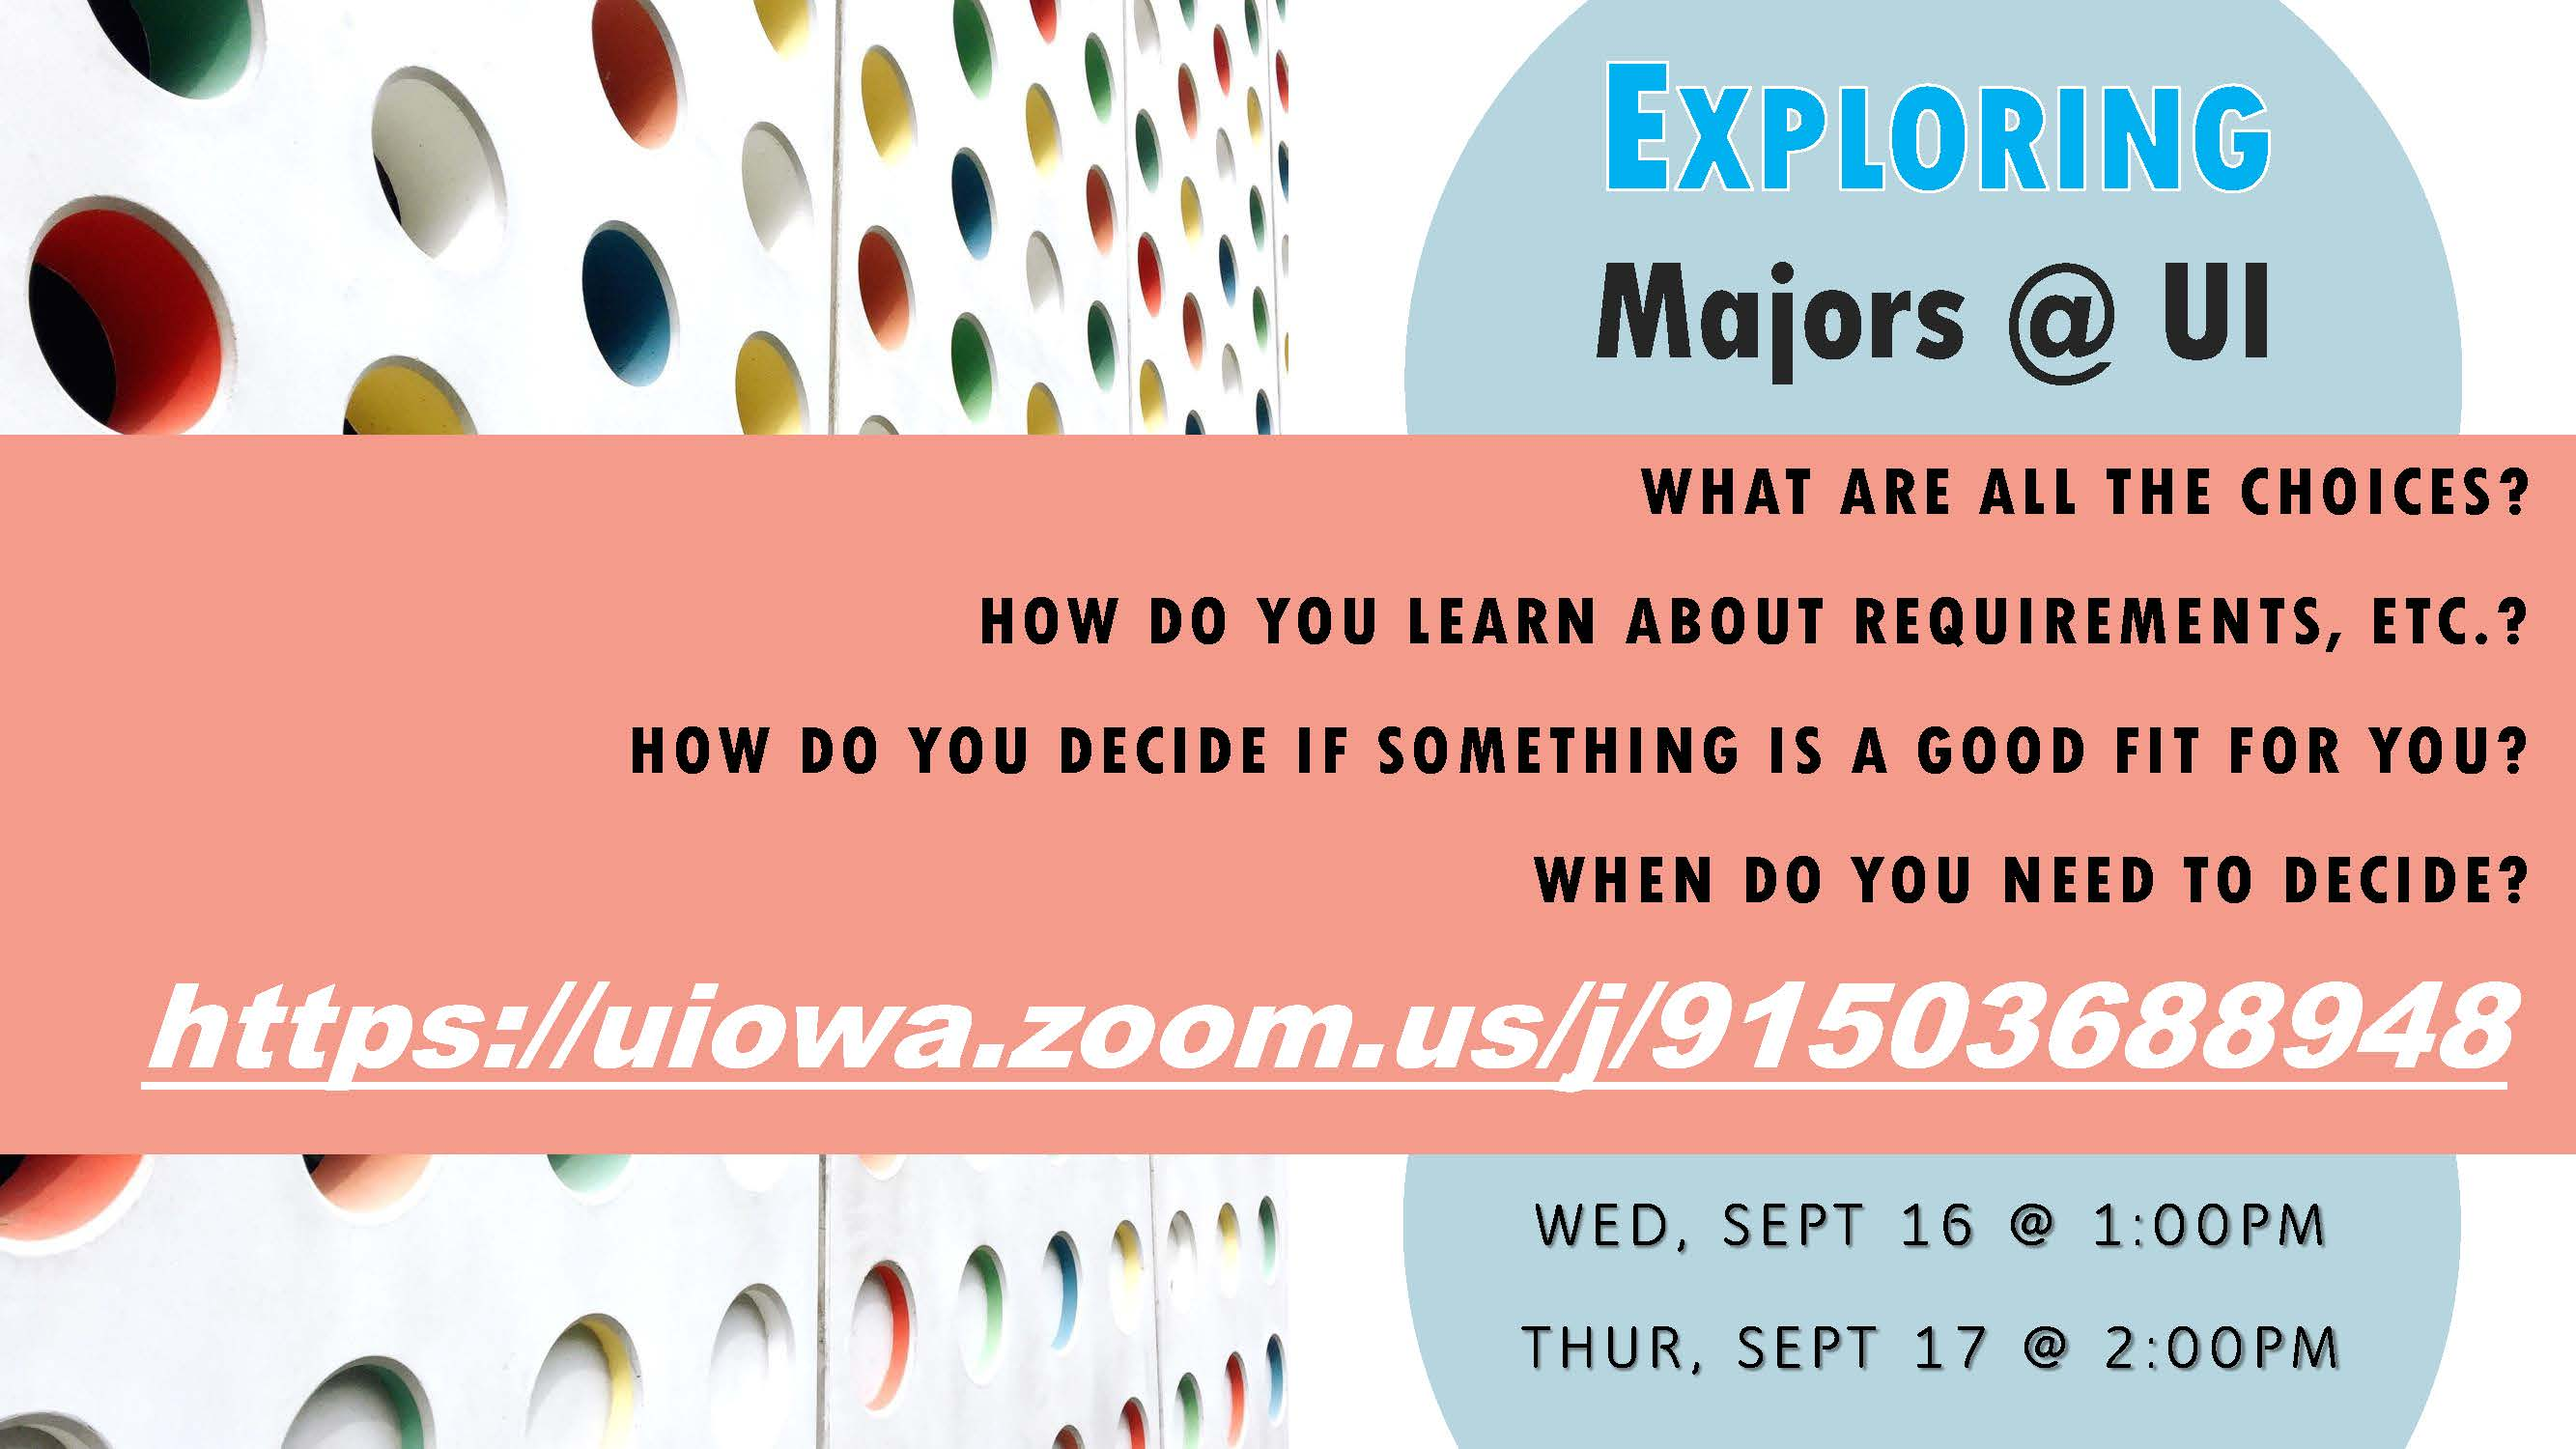 invitation to Exploring Majors @ UI